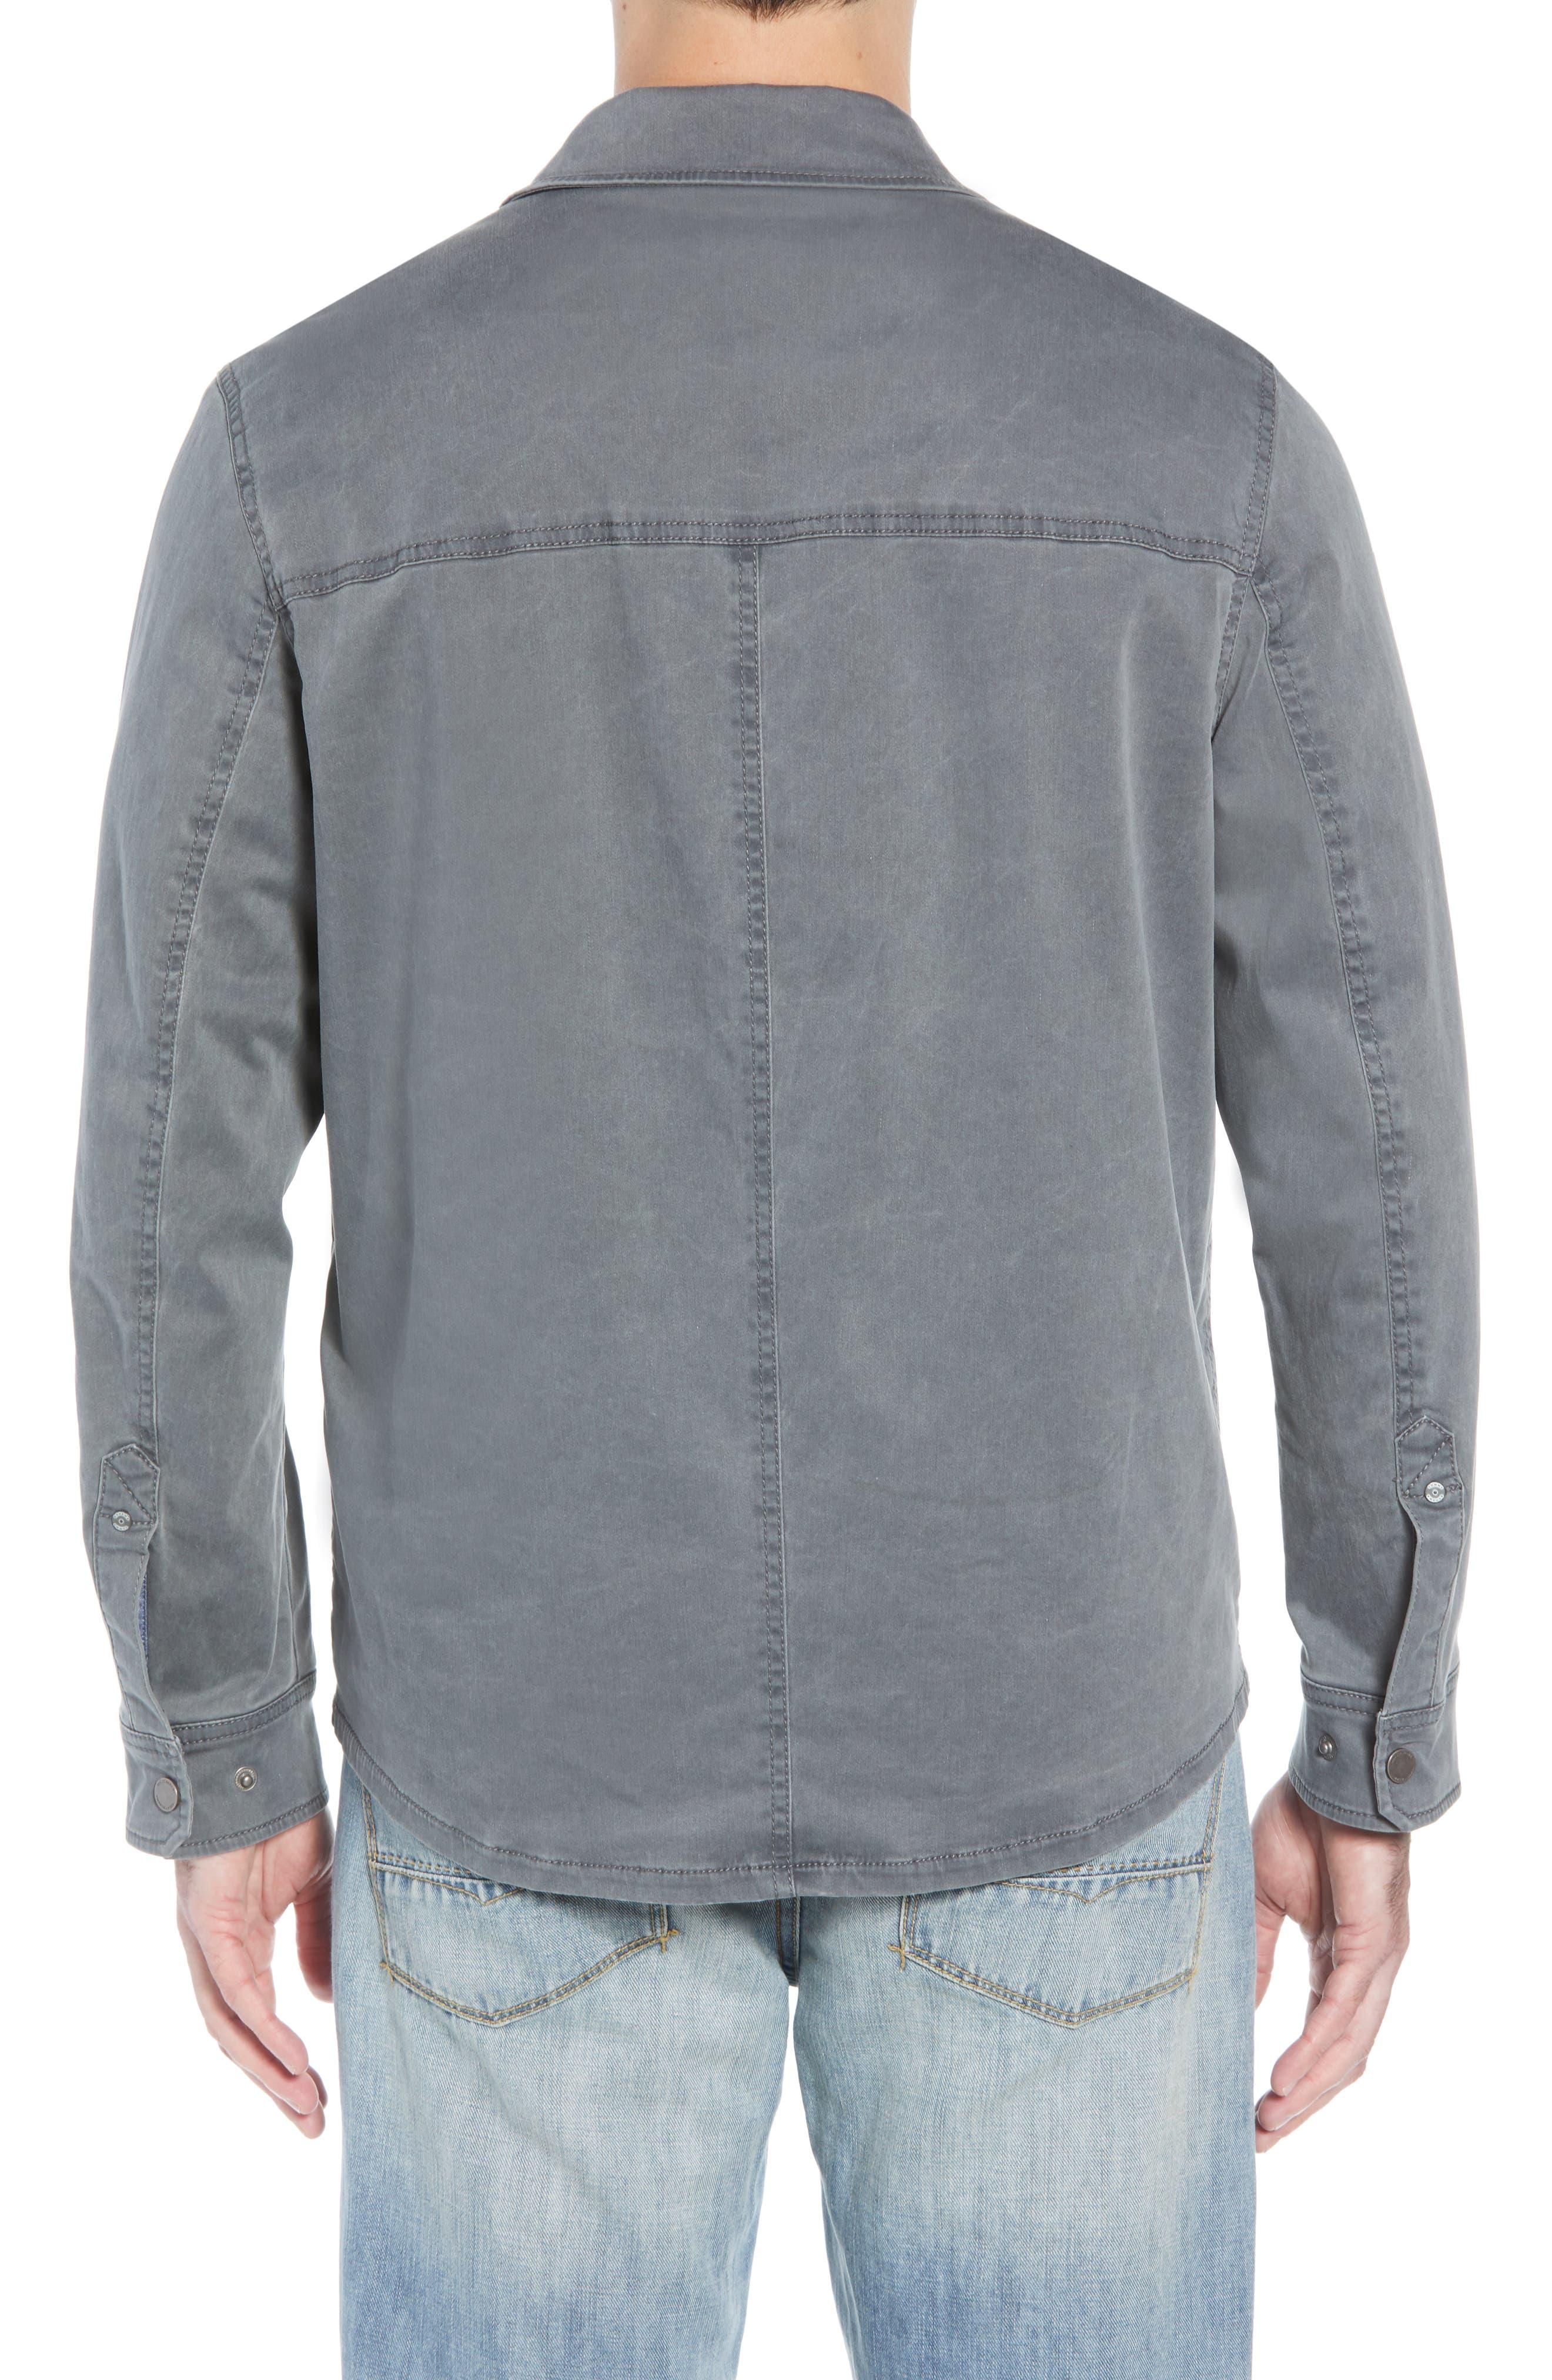 Boracay Regular Fit Shirt Jacket,                             Alternate thumbnail 2, color,                             FOG GREY